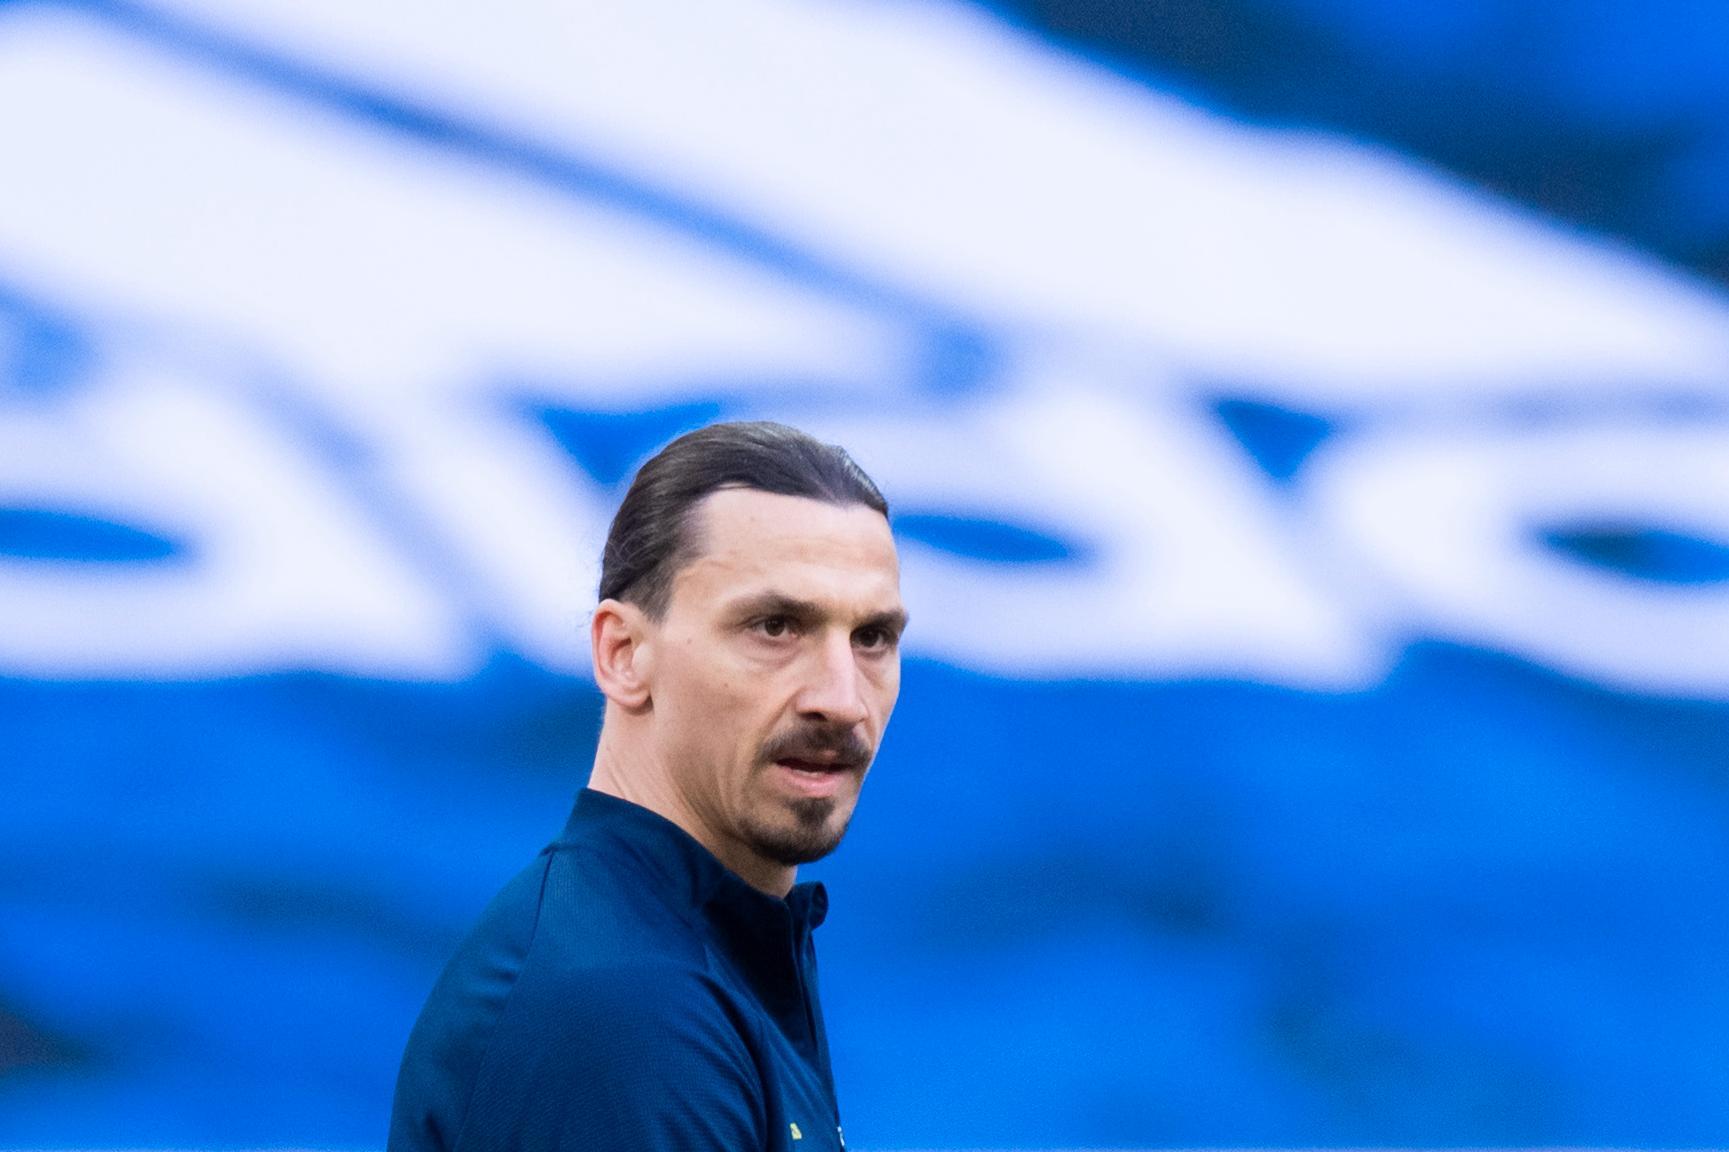 Zlatan Ibrahimovic gjorde comeback i landslaget i samband med VM-kvalet.